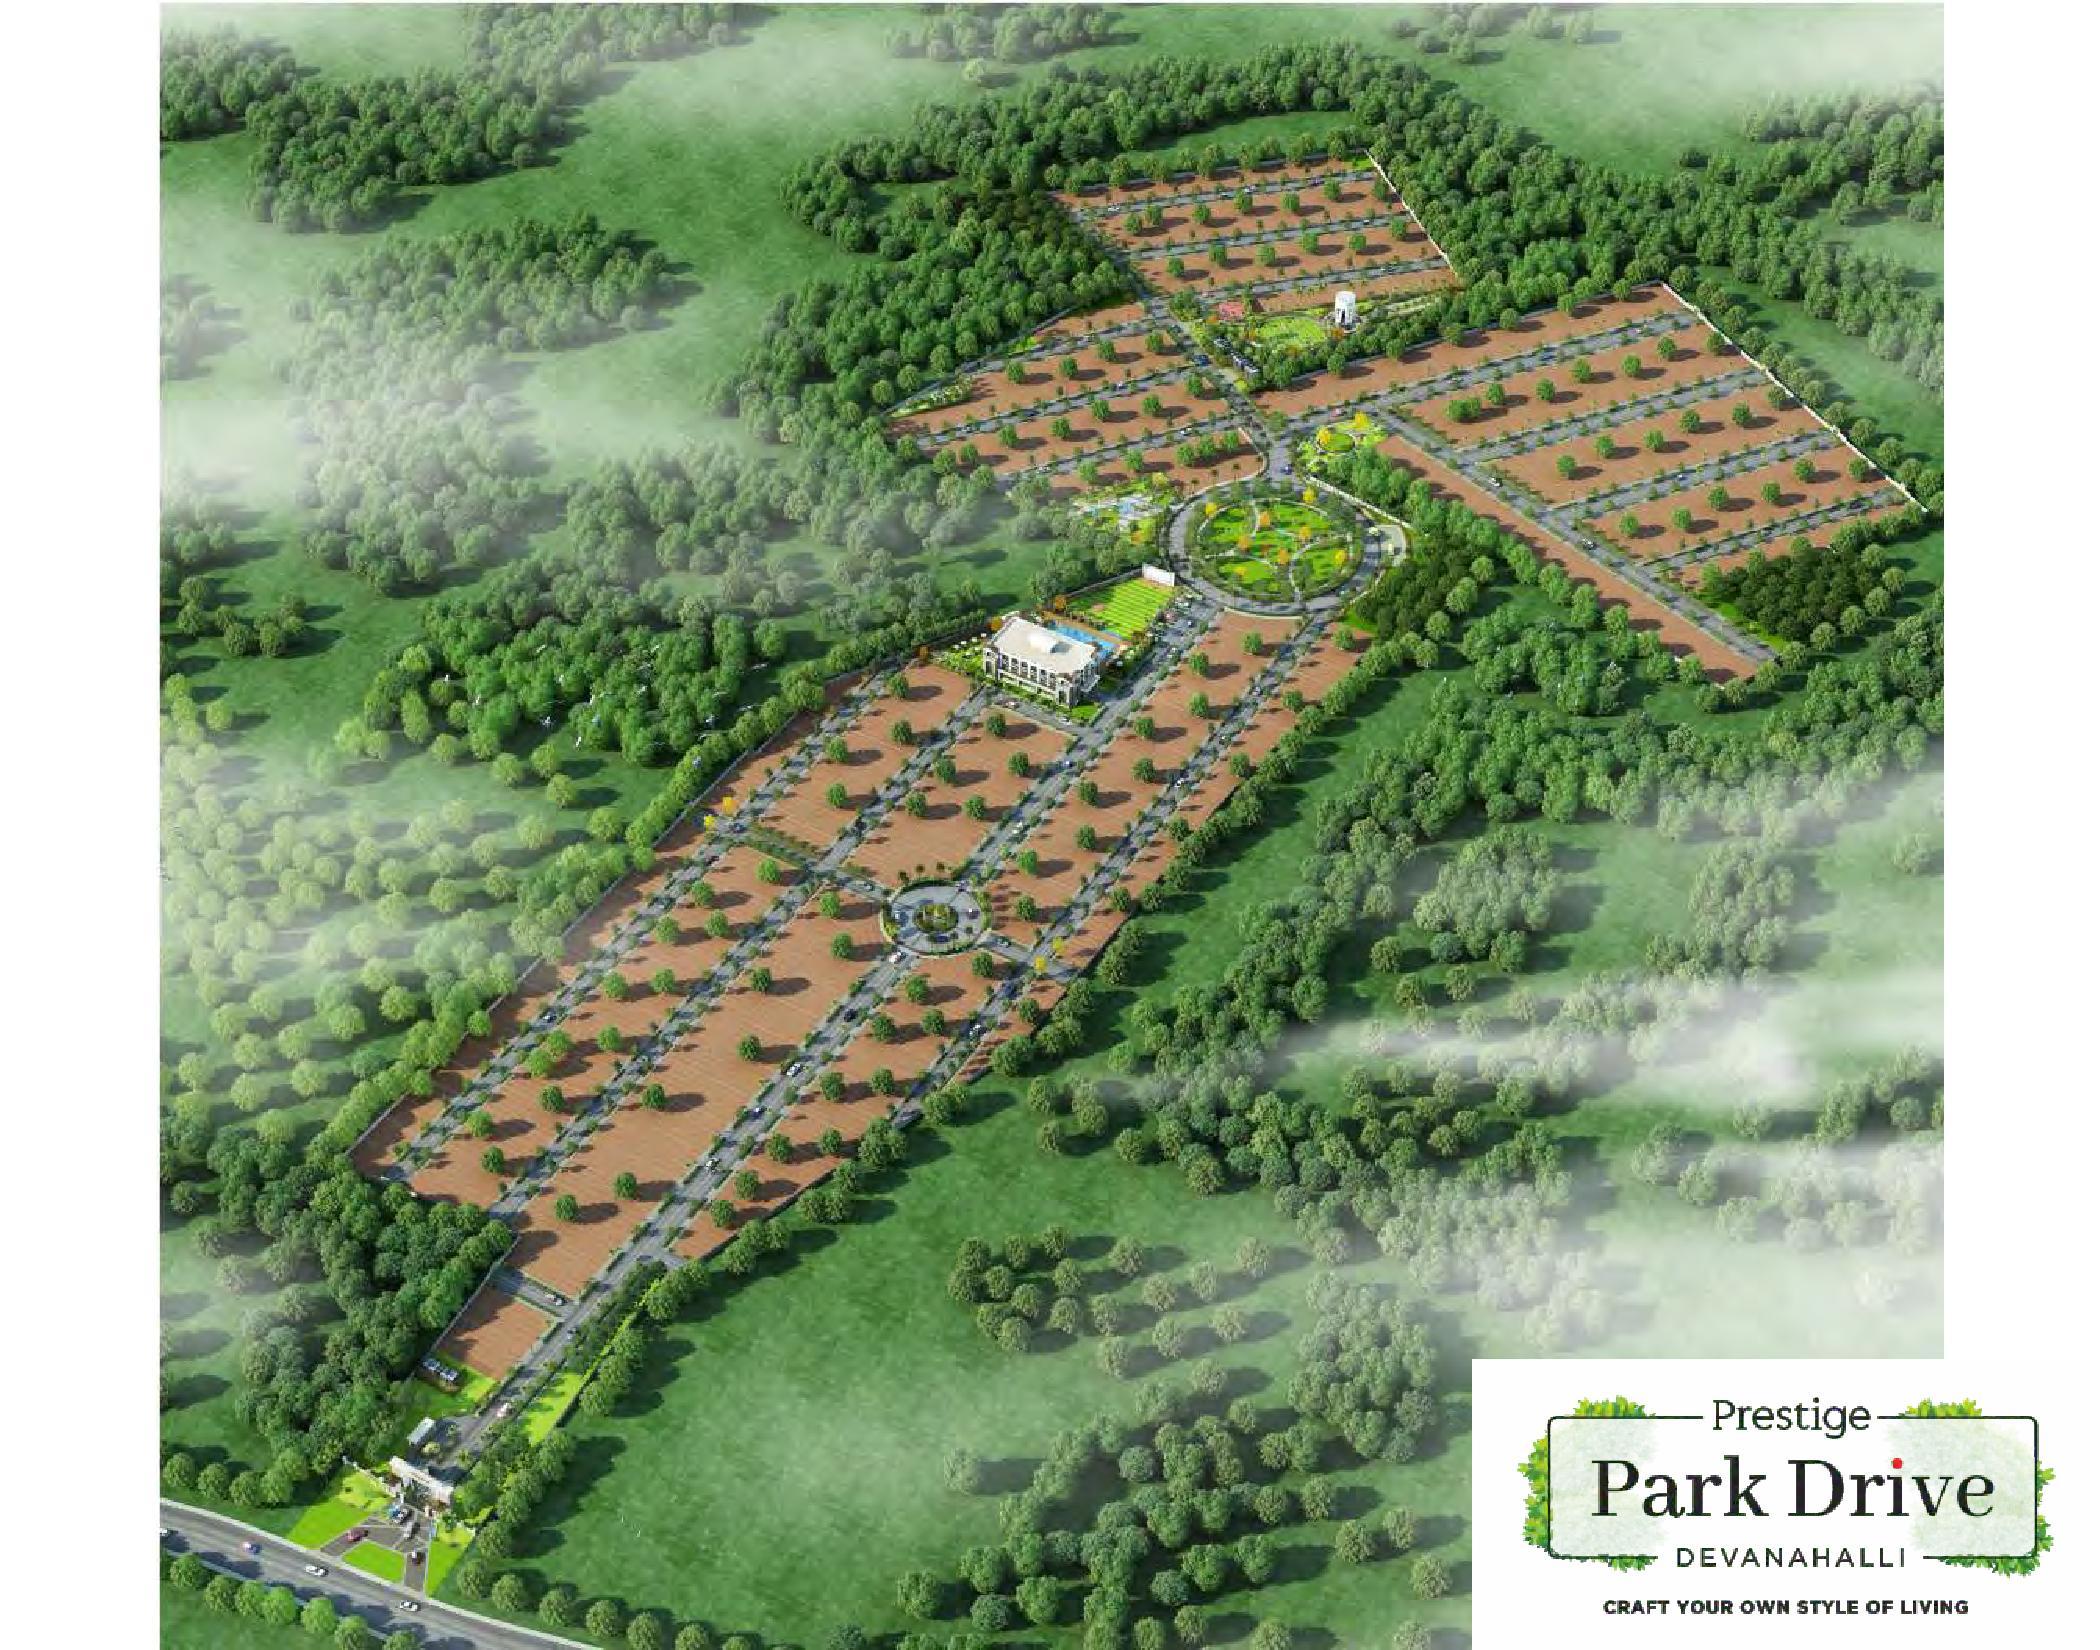 Prestige-Park-Drive-Plot-in-Devanahalli-Bangalore-Image-01